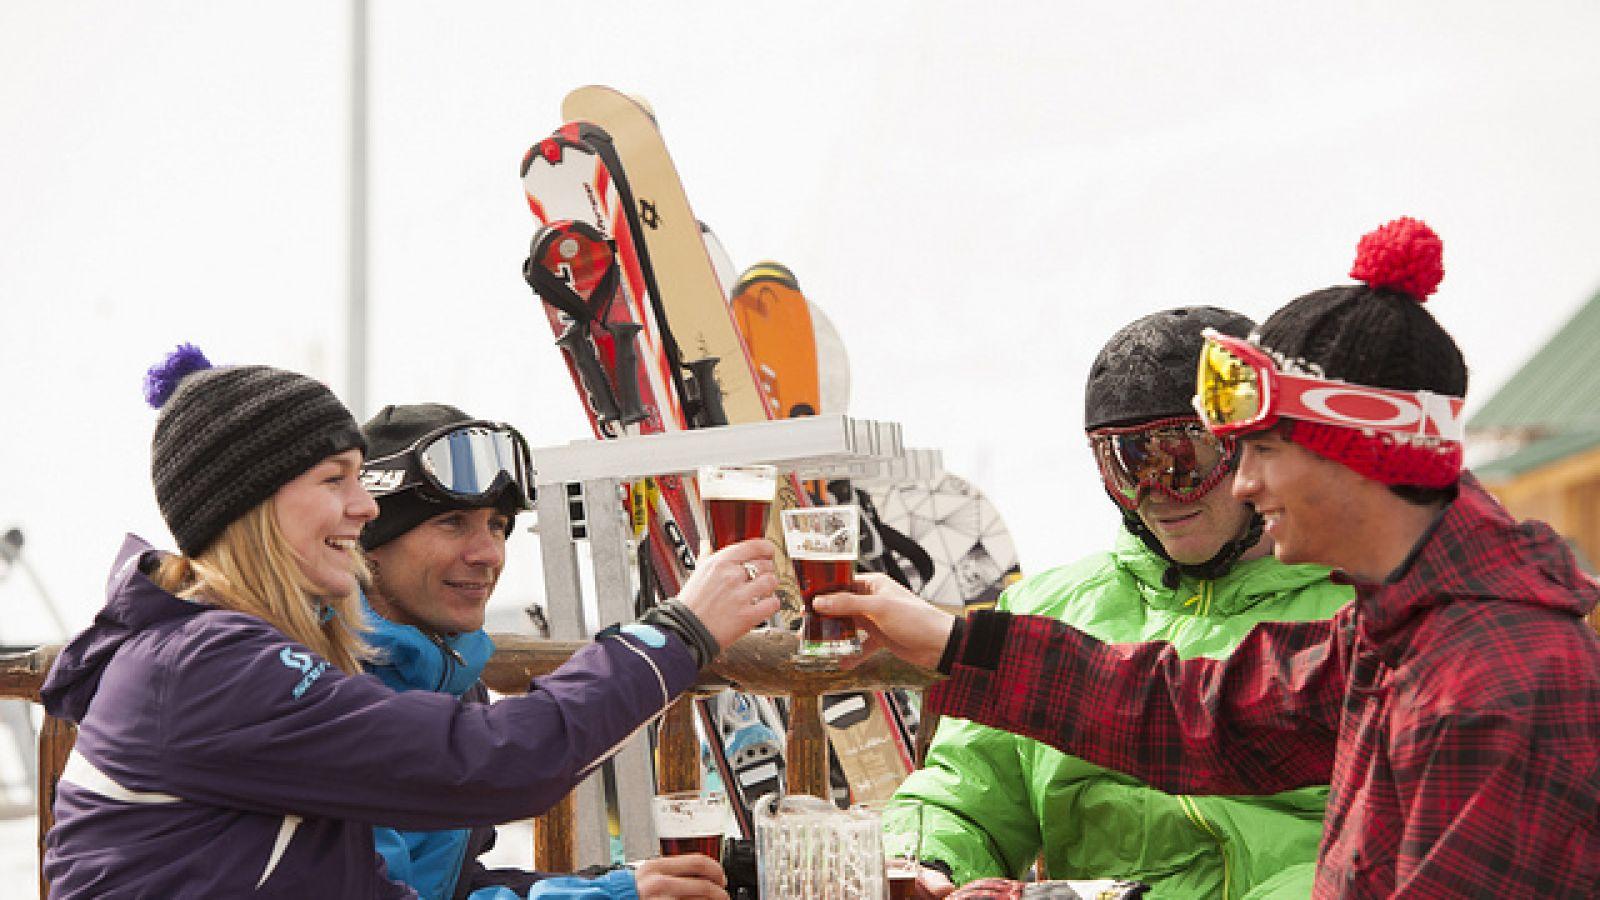 Apres ski fun.